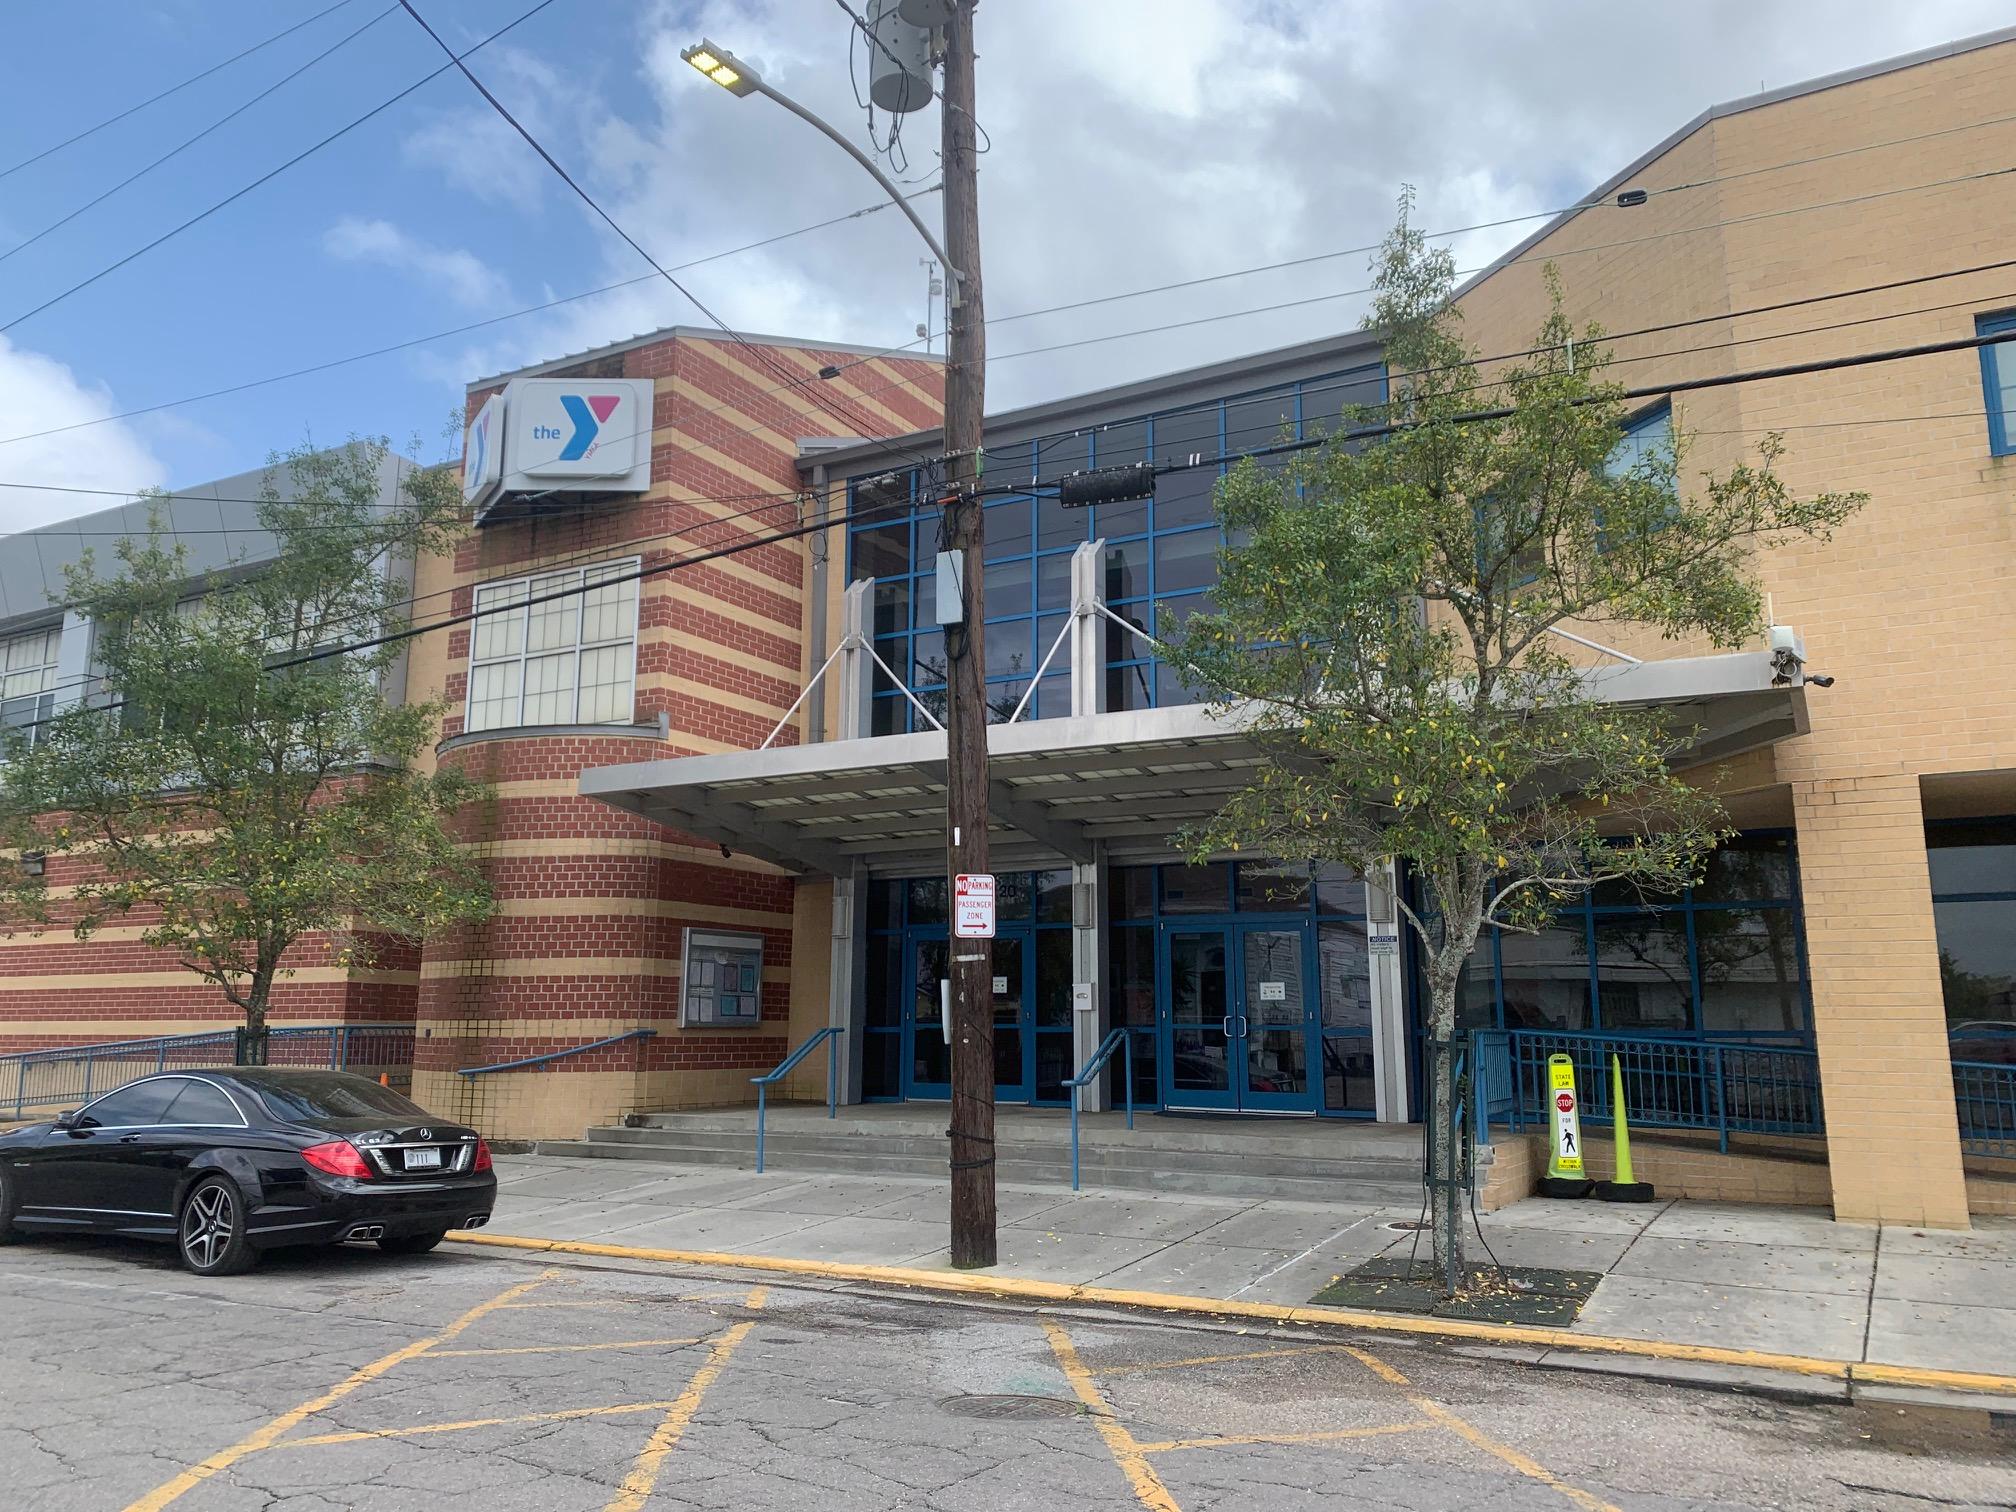 NOLA Public Schools backs off plan to abruptly close Singleton